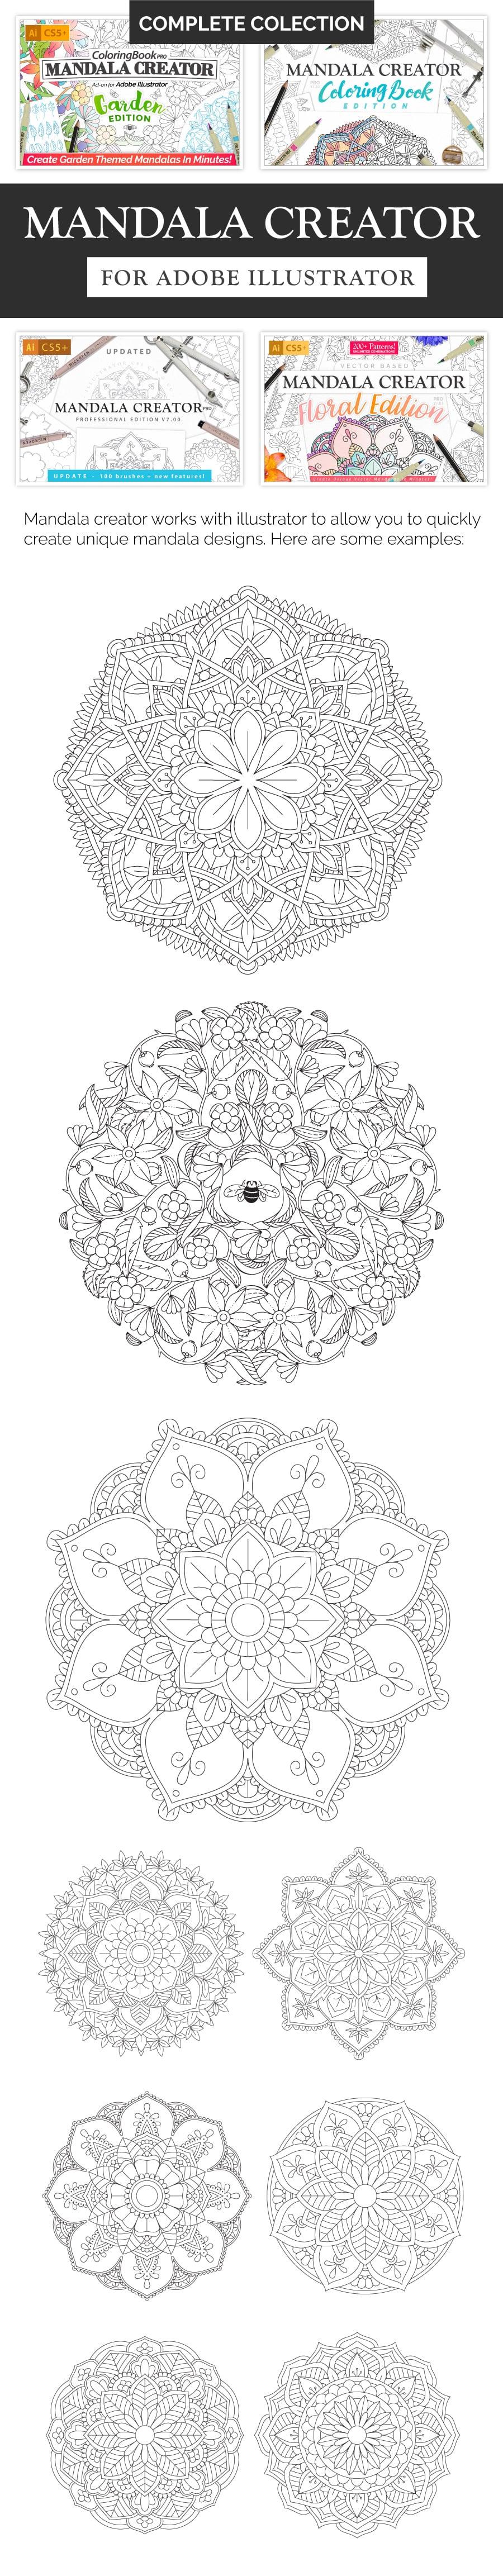 Best Mandala Creator in 2020. Bundle Collection - 800+ Patterns. Only $29! - Mandala Creator long 4